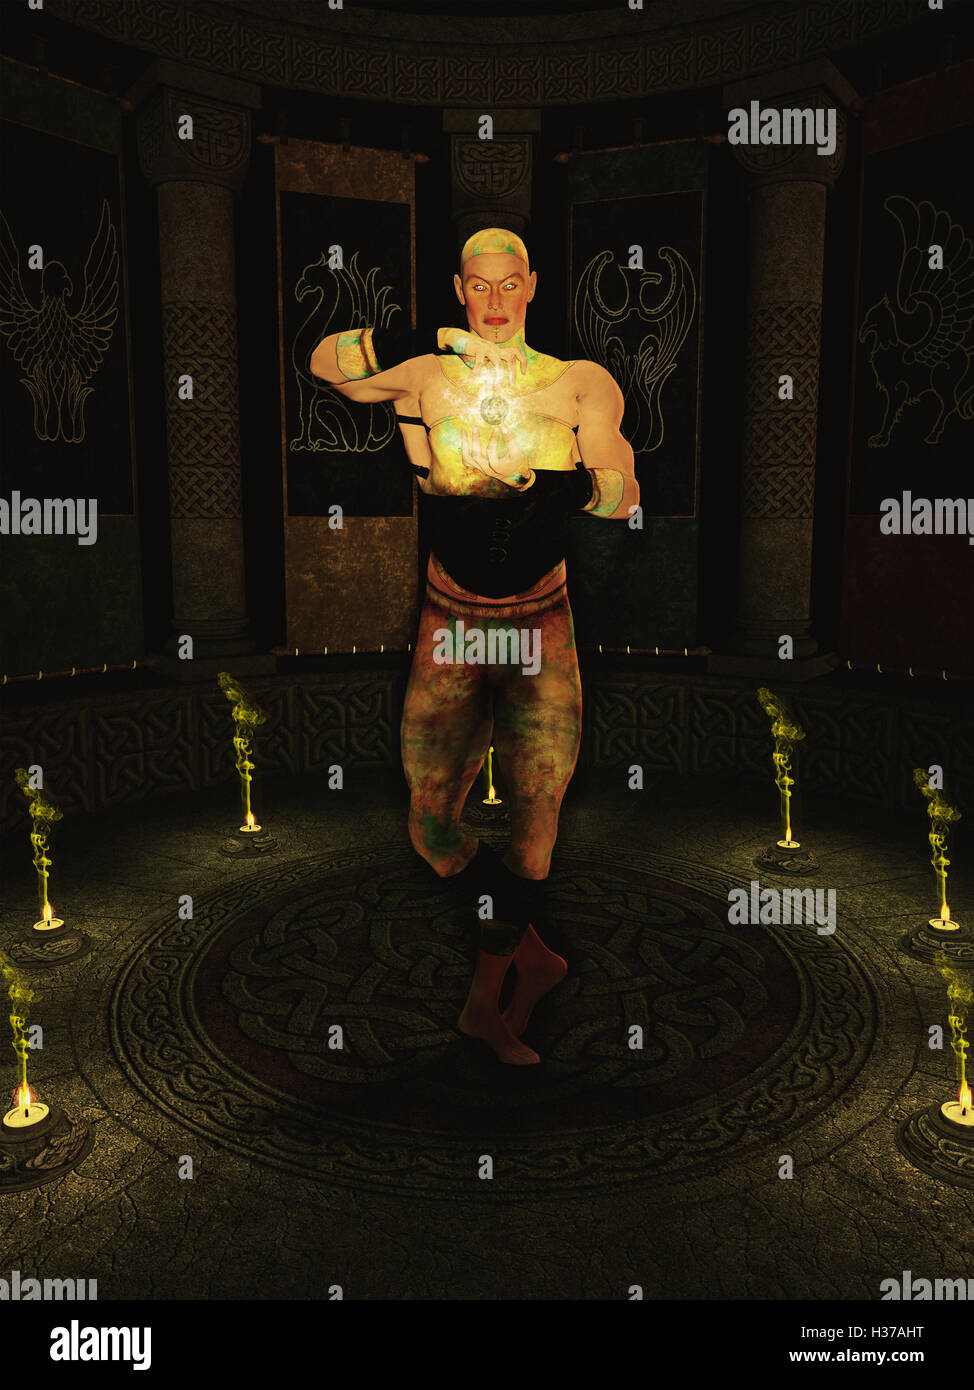 Alchemy Man - Stock Image